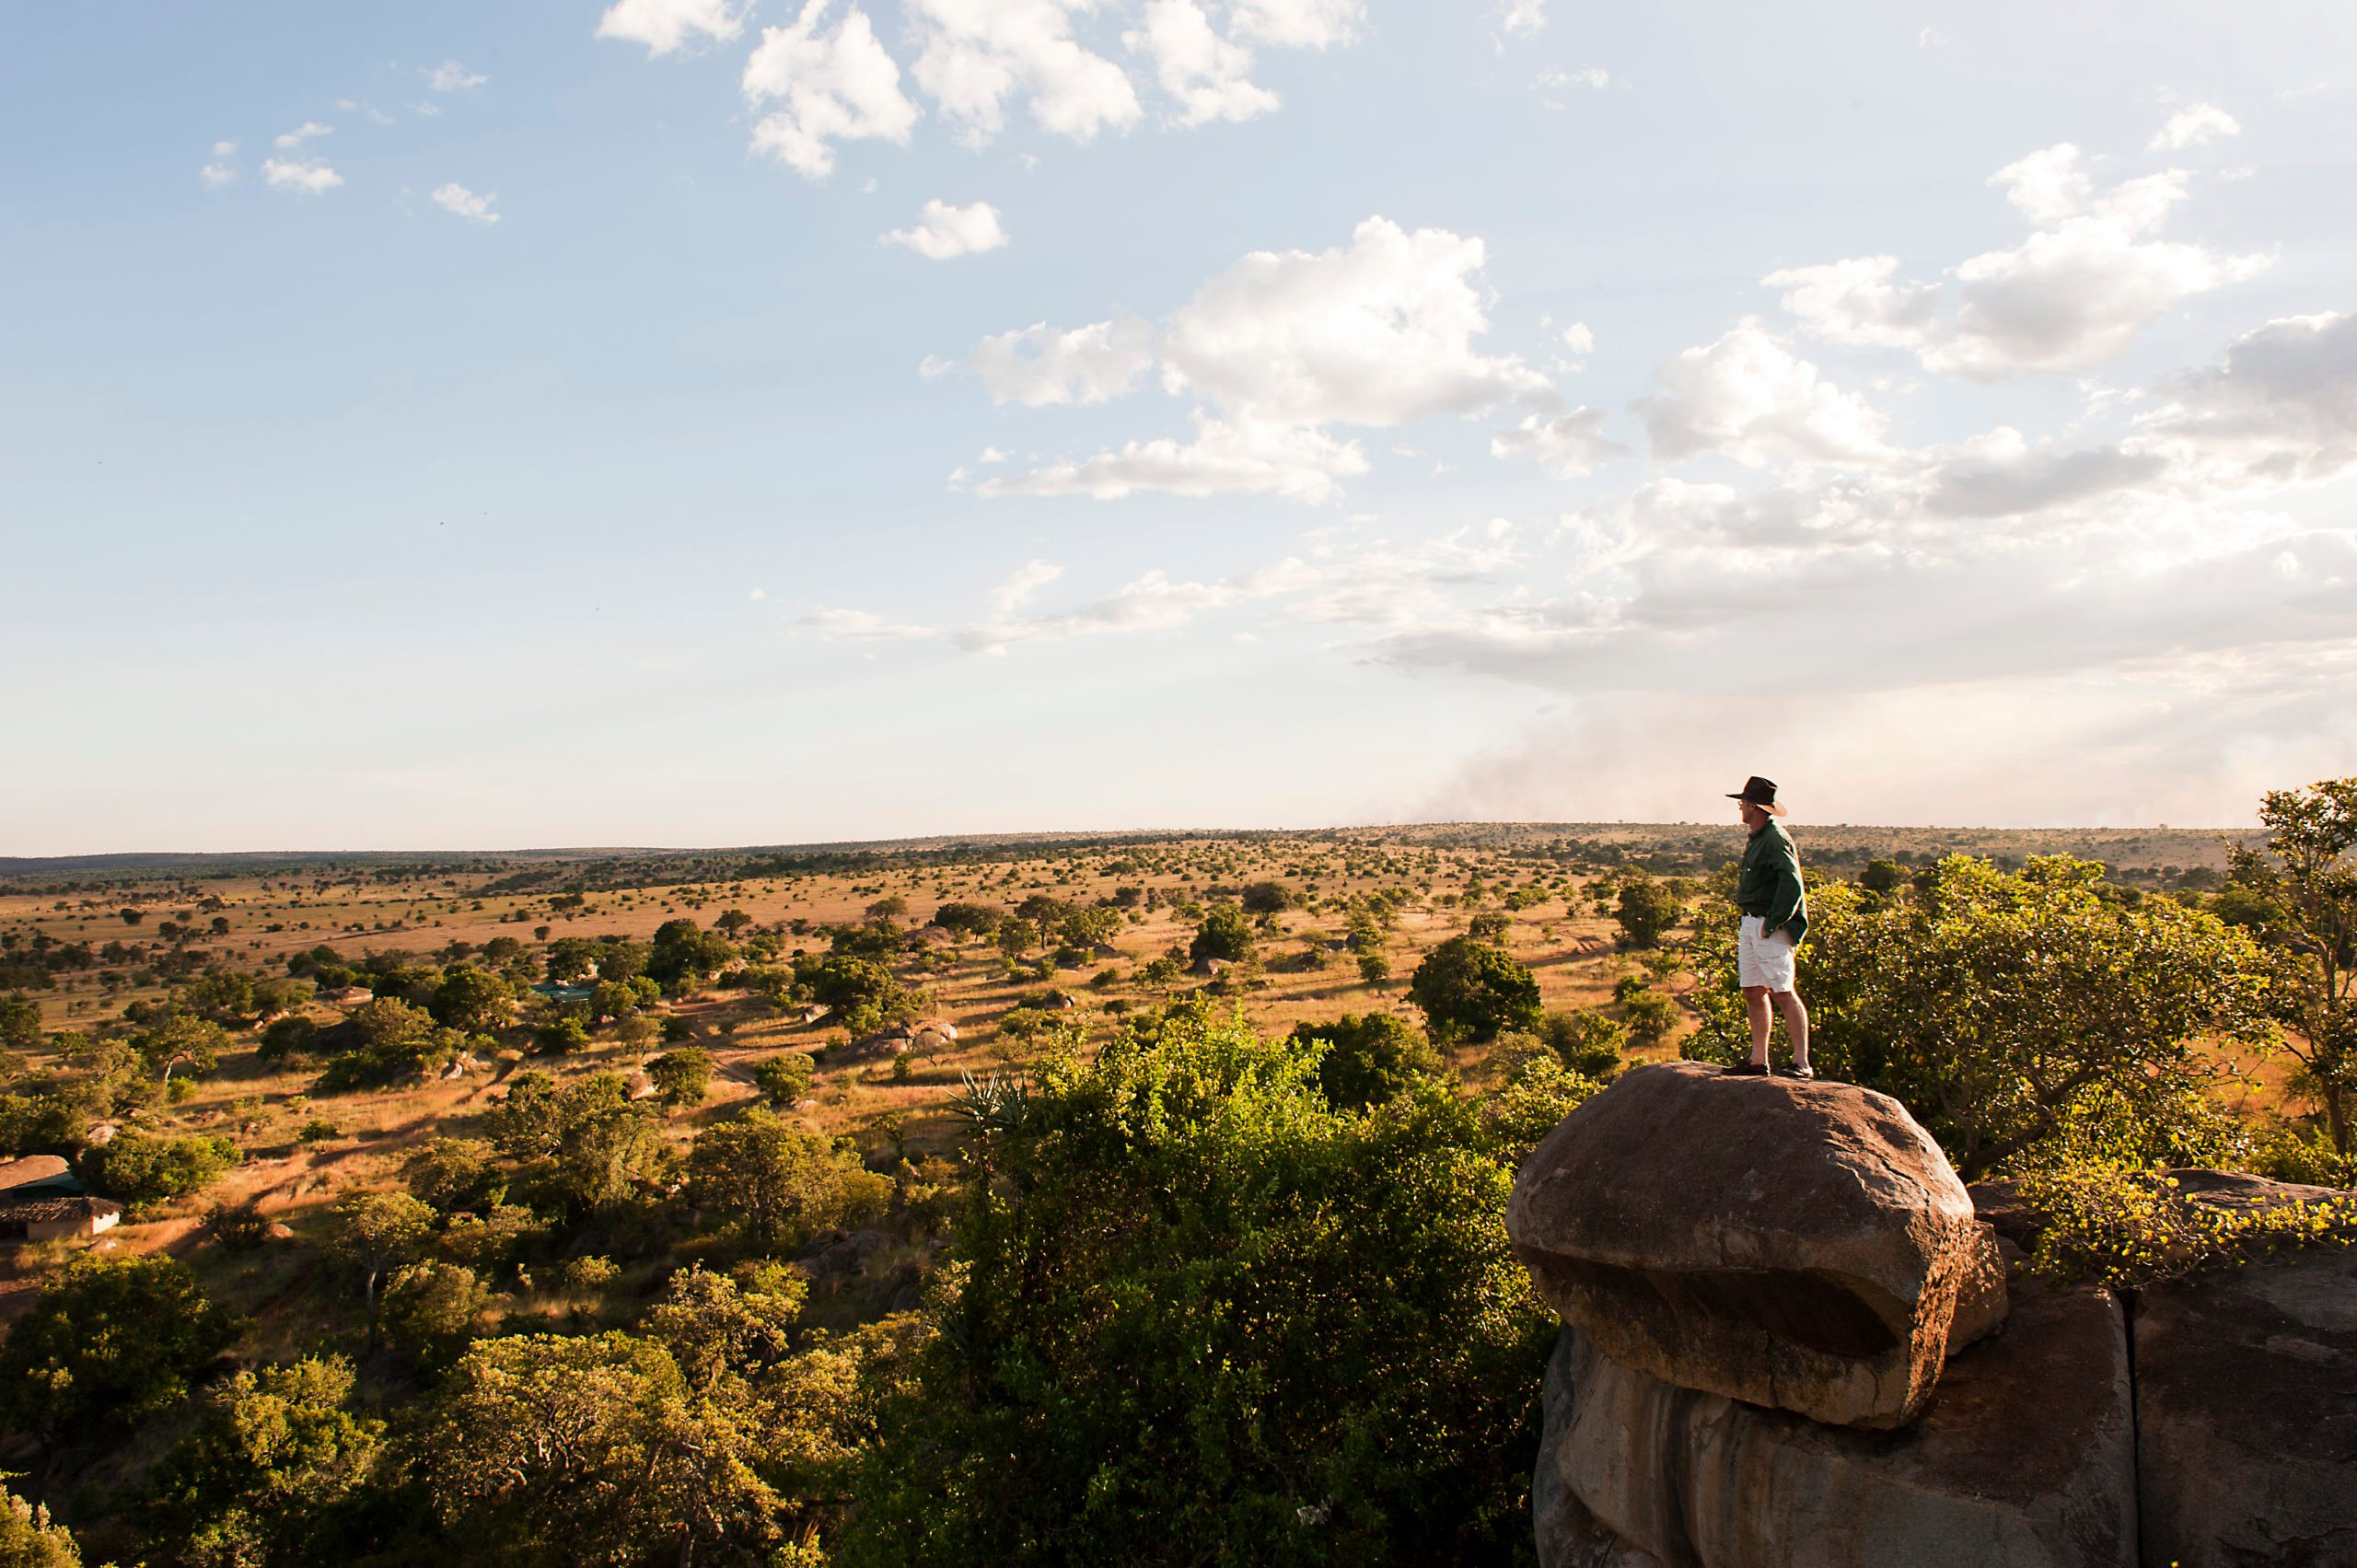 Nomads Northern Tanzania